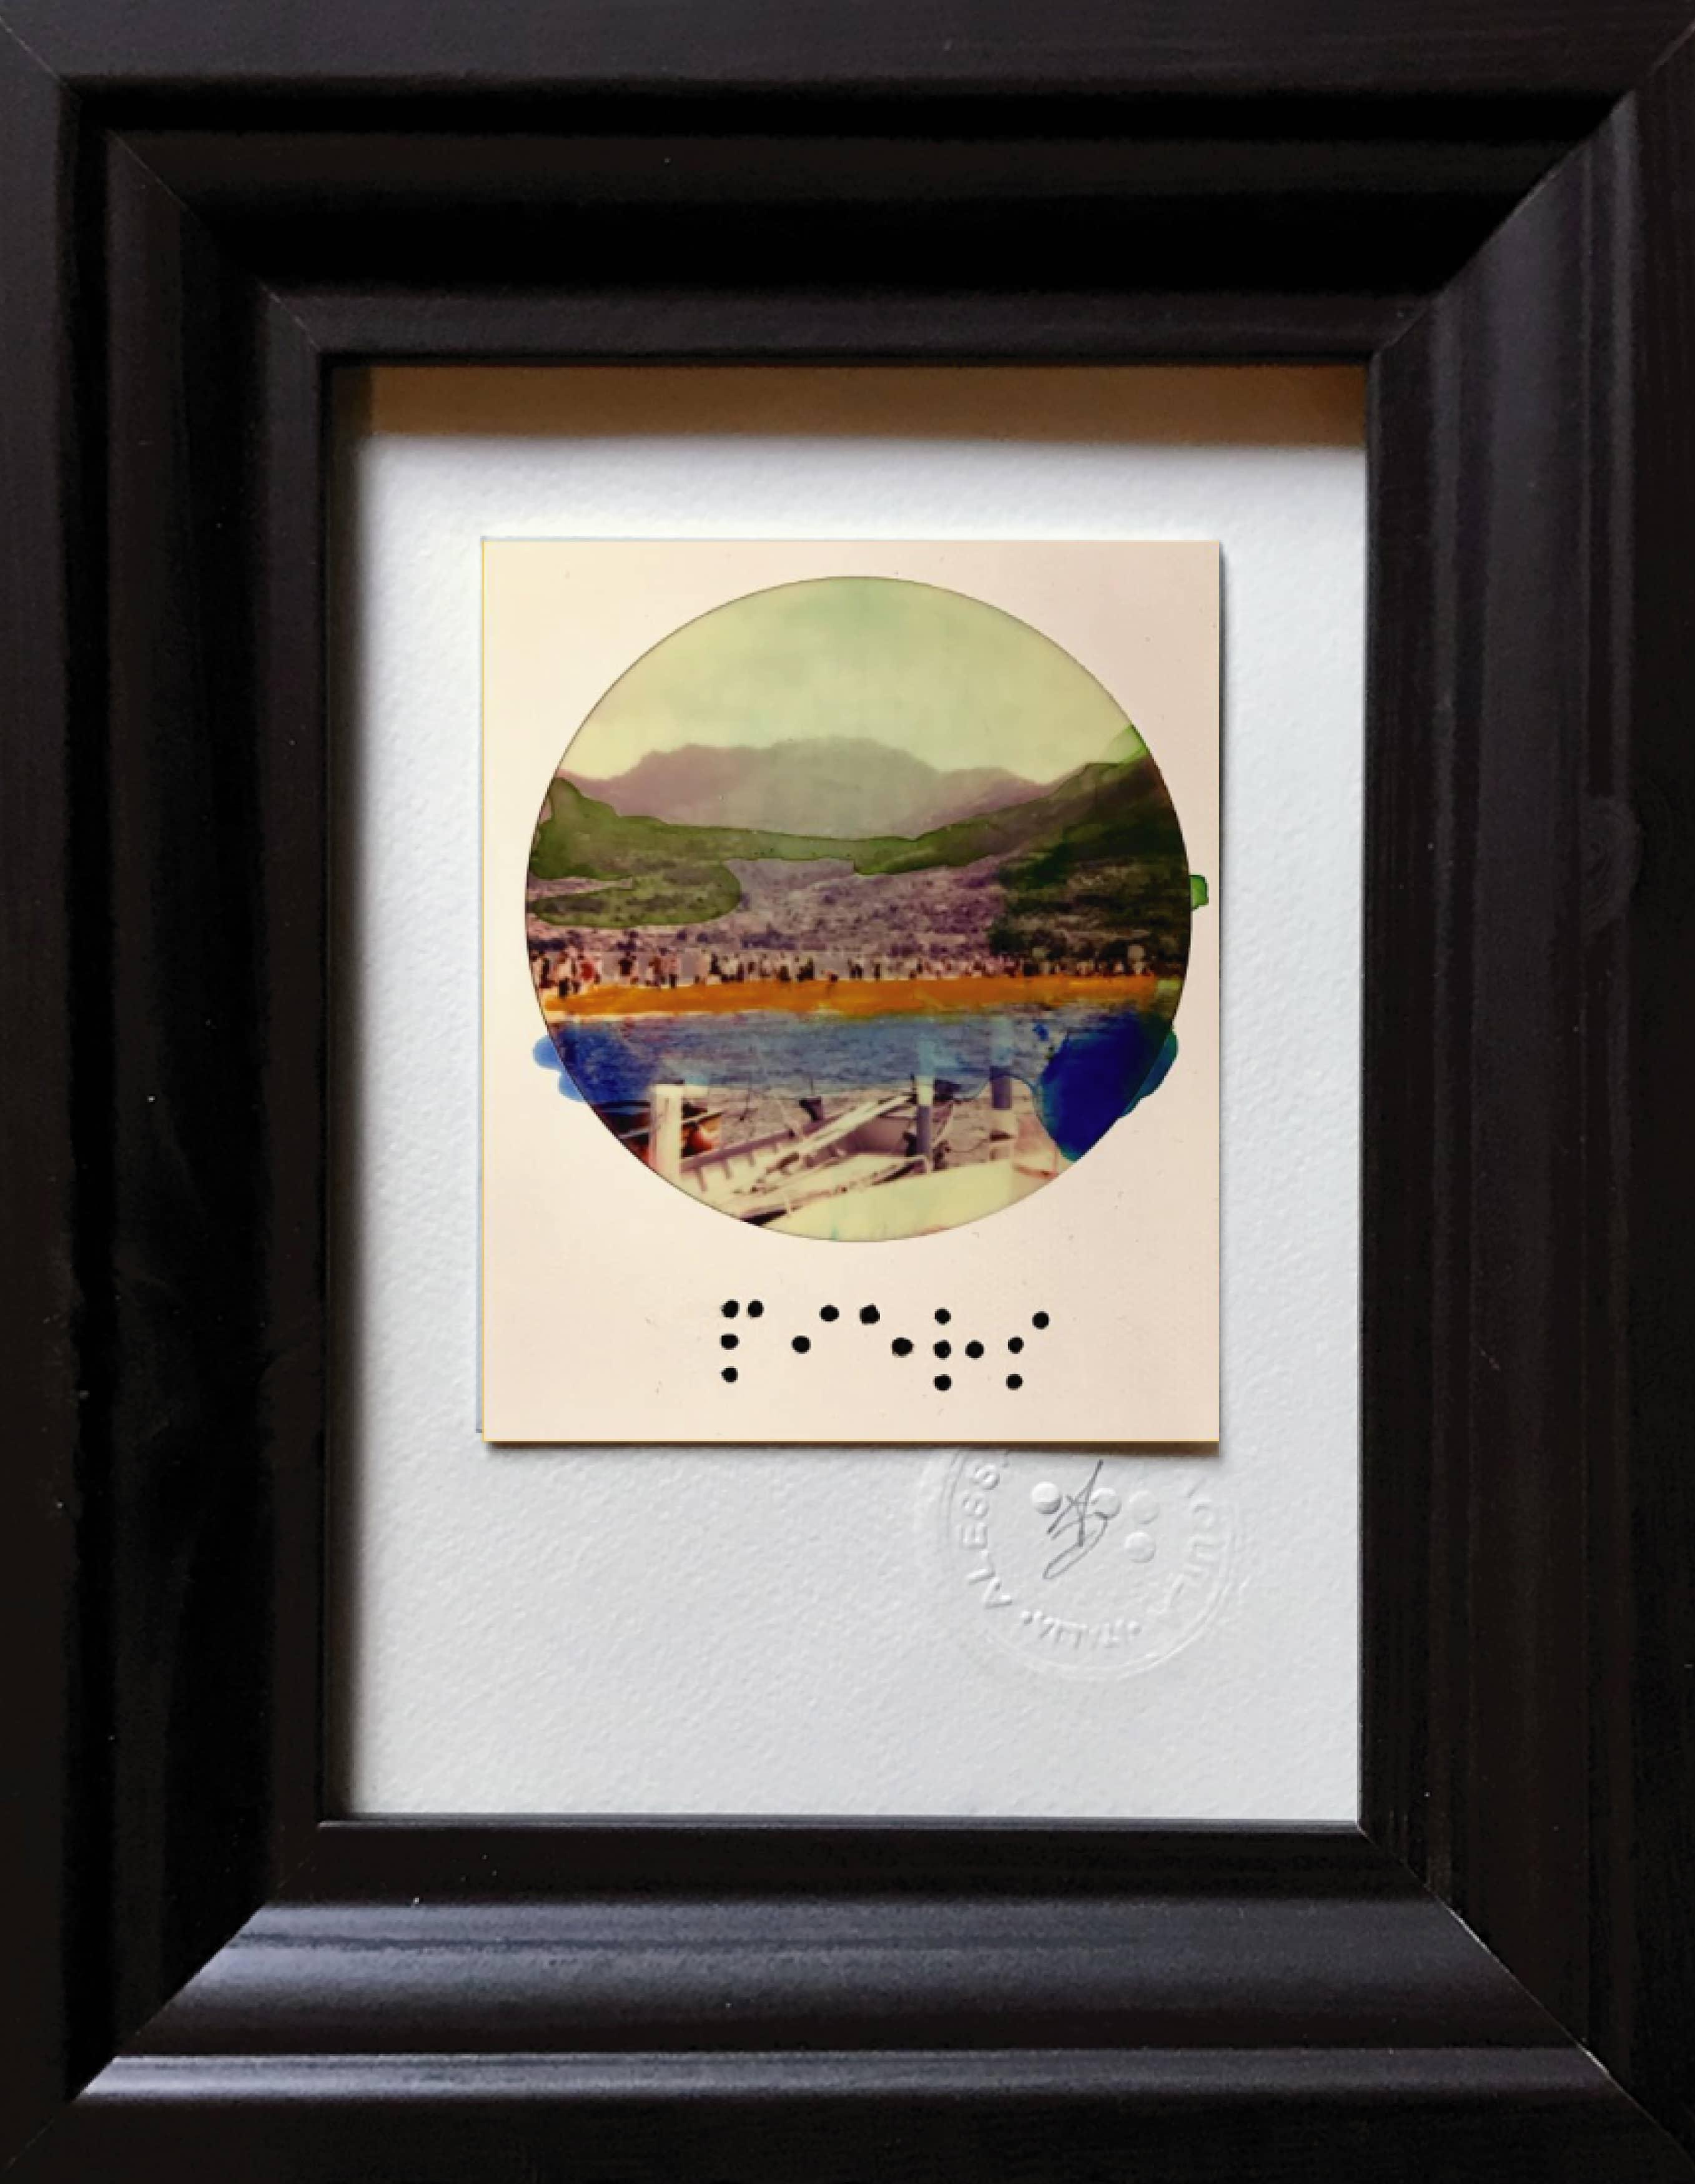 The Floating Polaroid #10